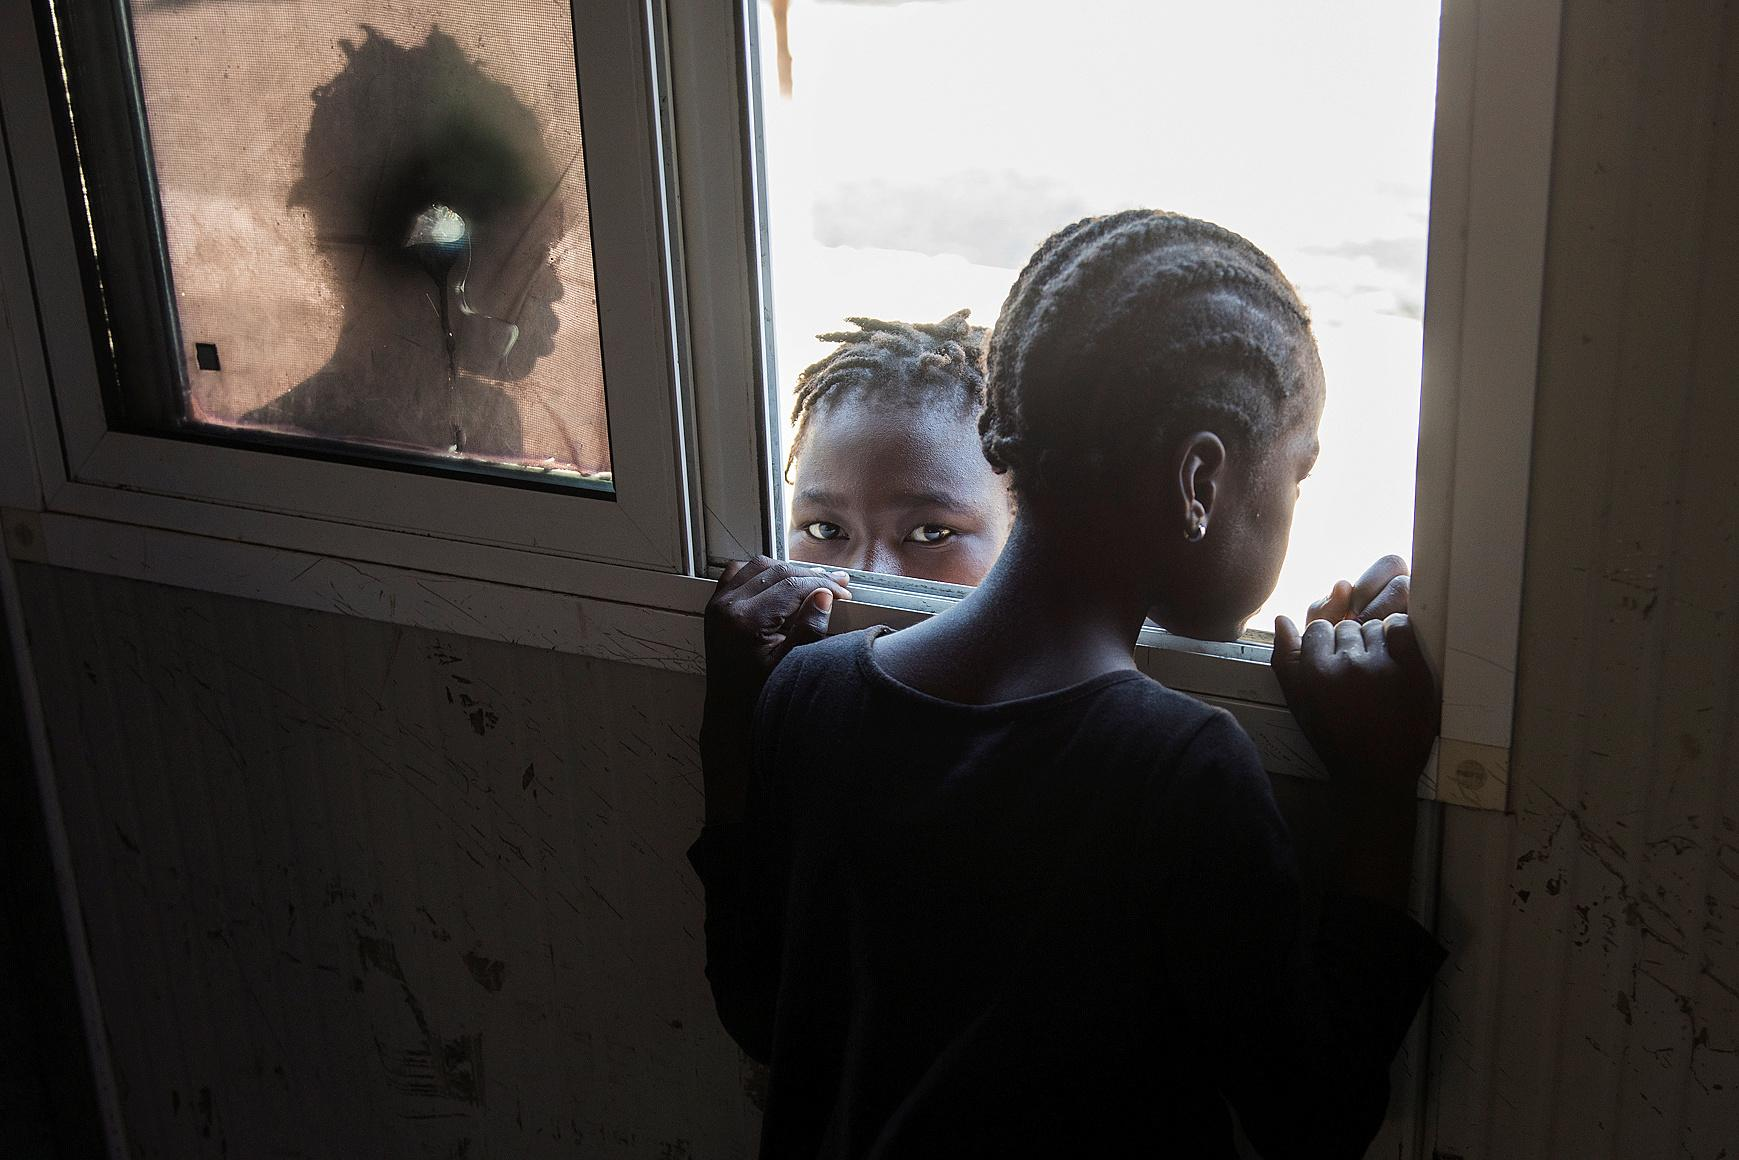 Haitian slums descend into anarchy as crisis sparks worst violence...